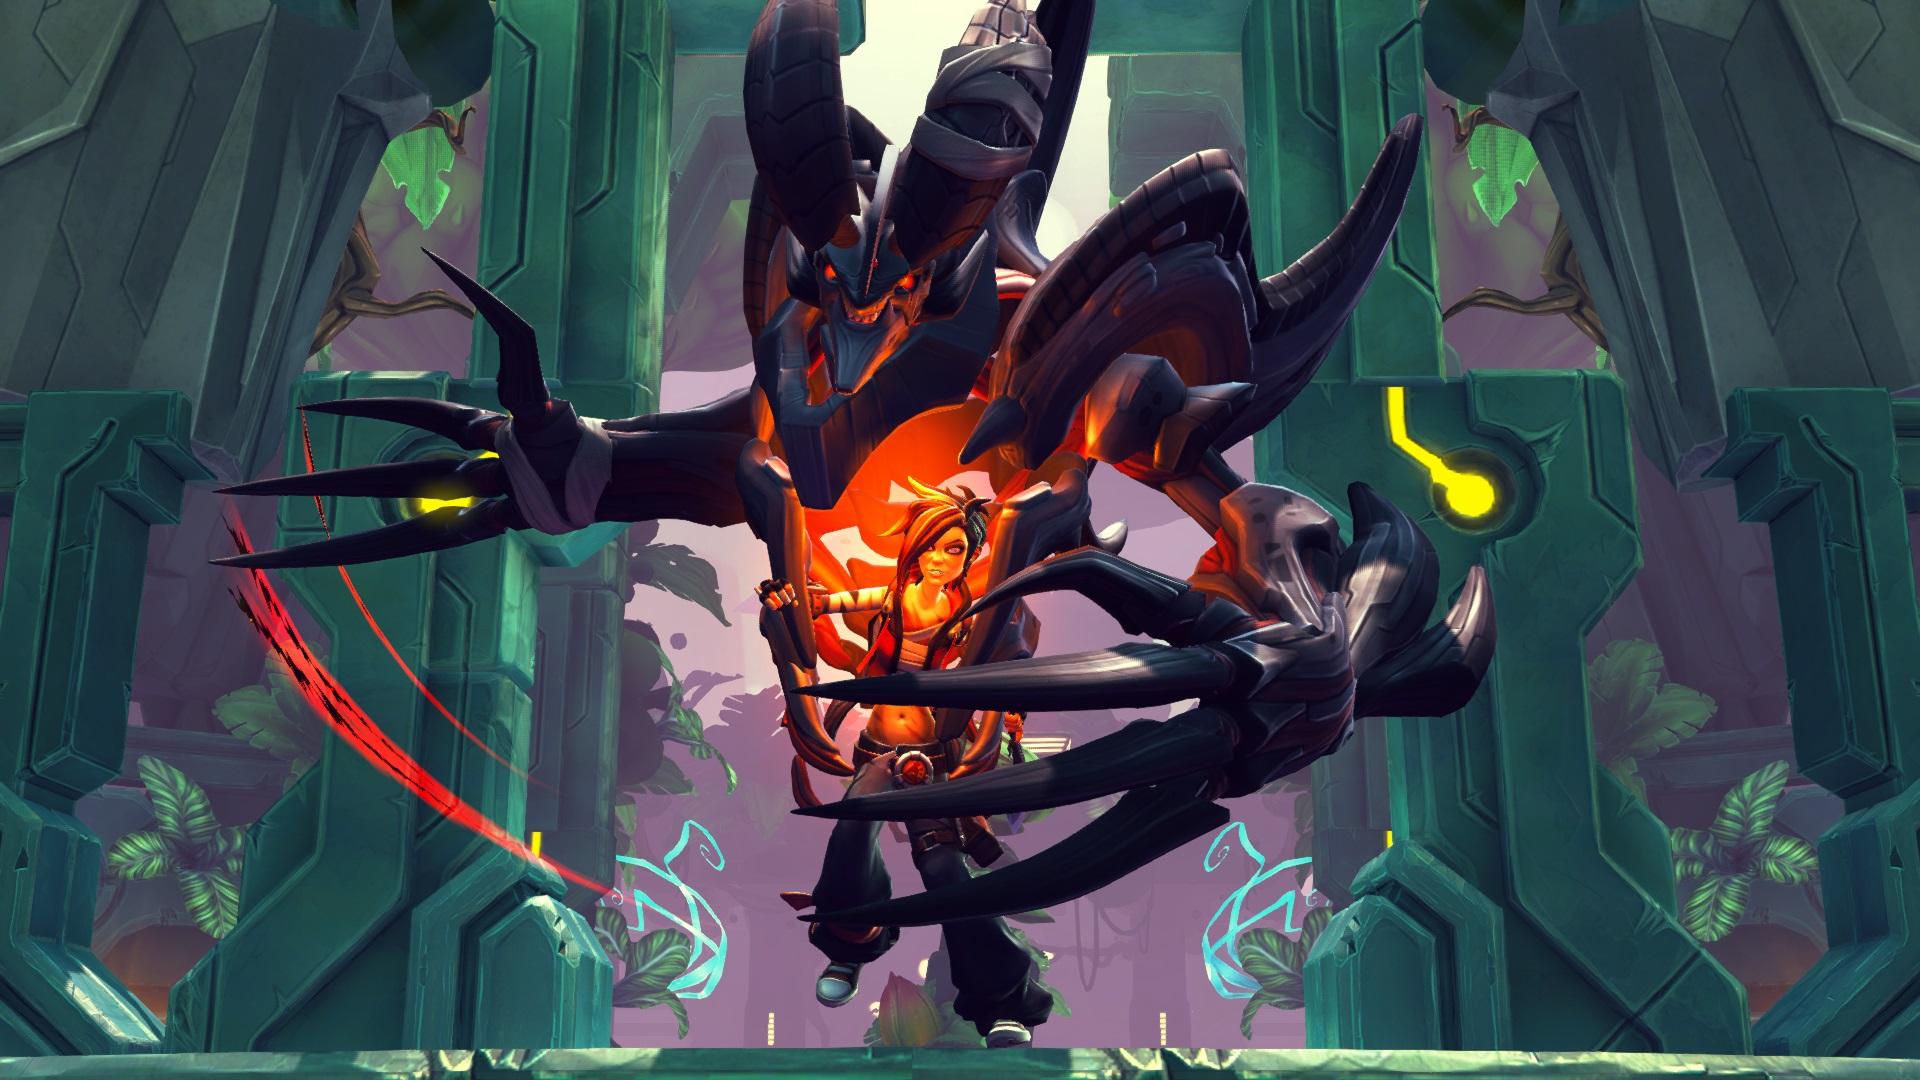 Battleborn_IN-GAME-IMAGES_TP_Shayne-&-Aurox (1)